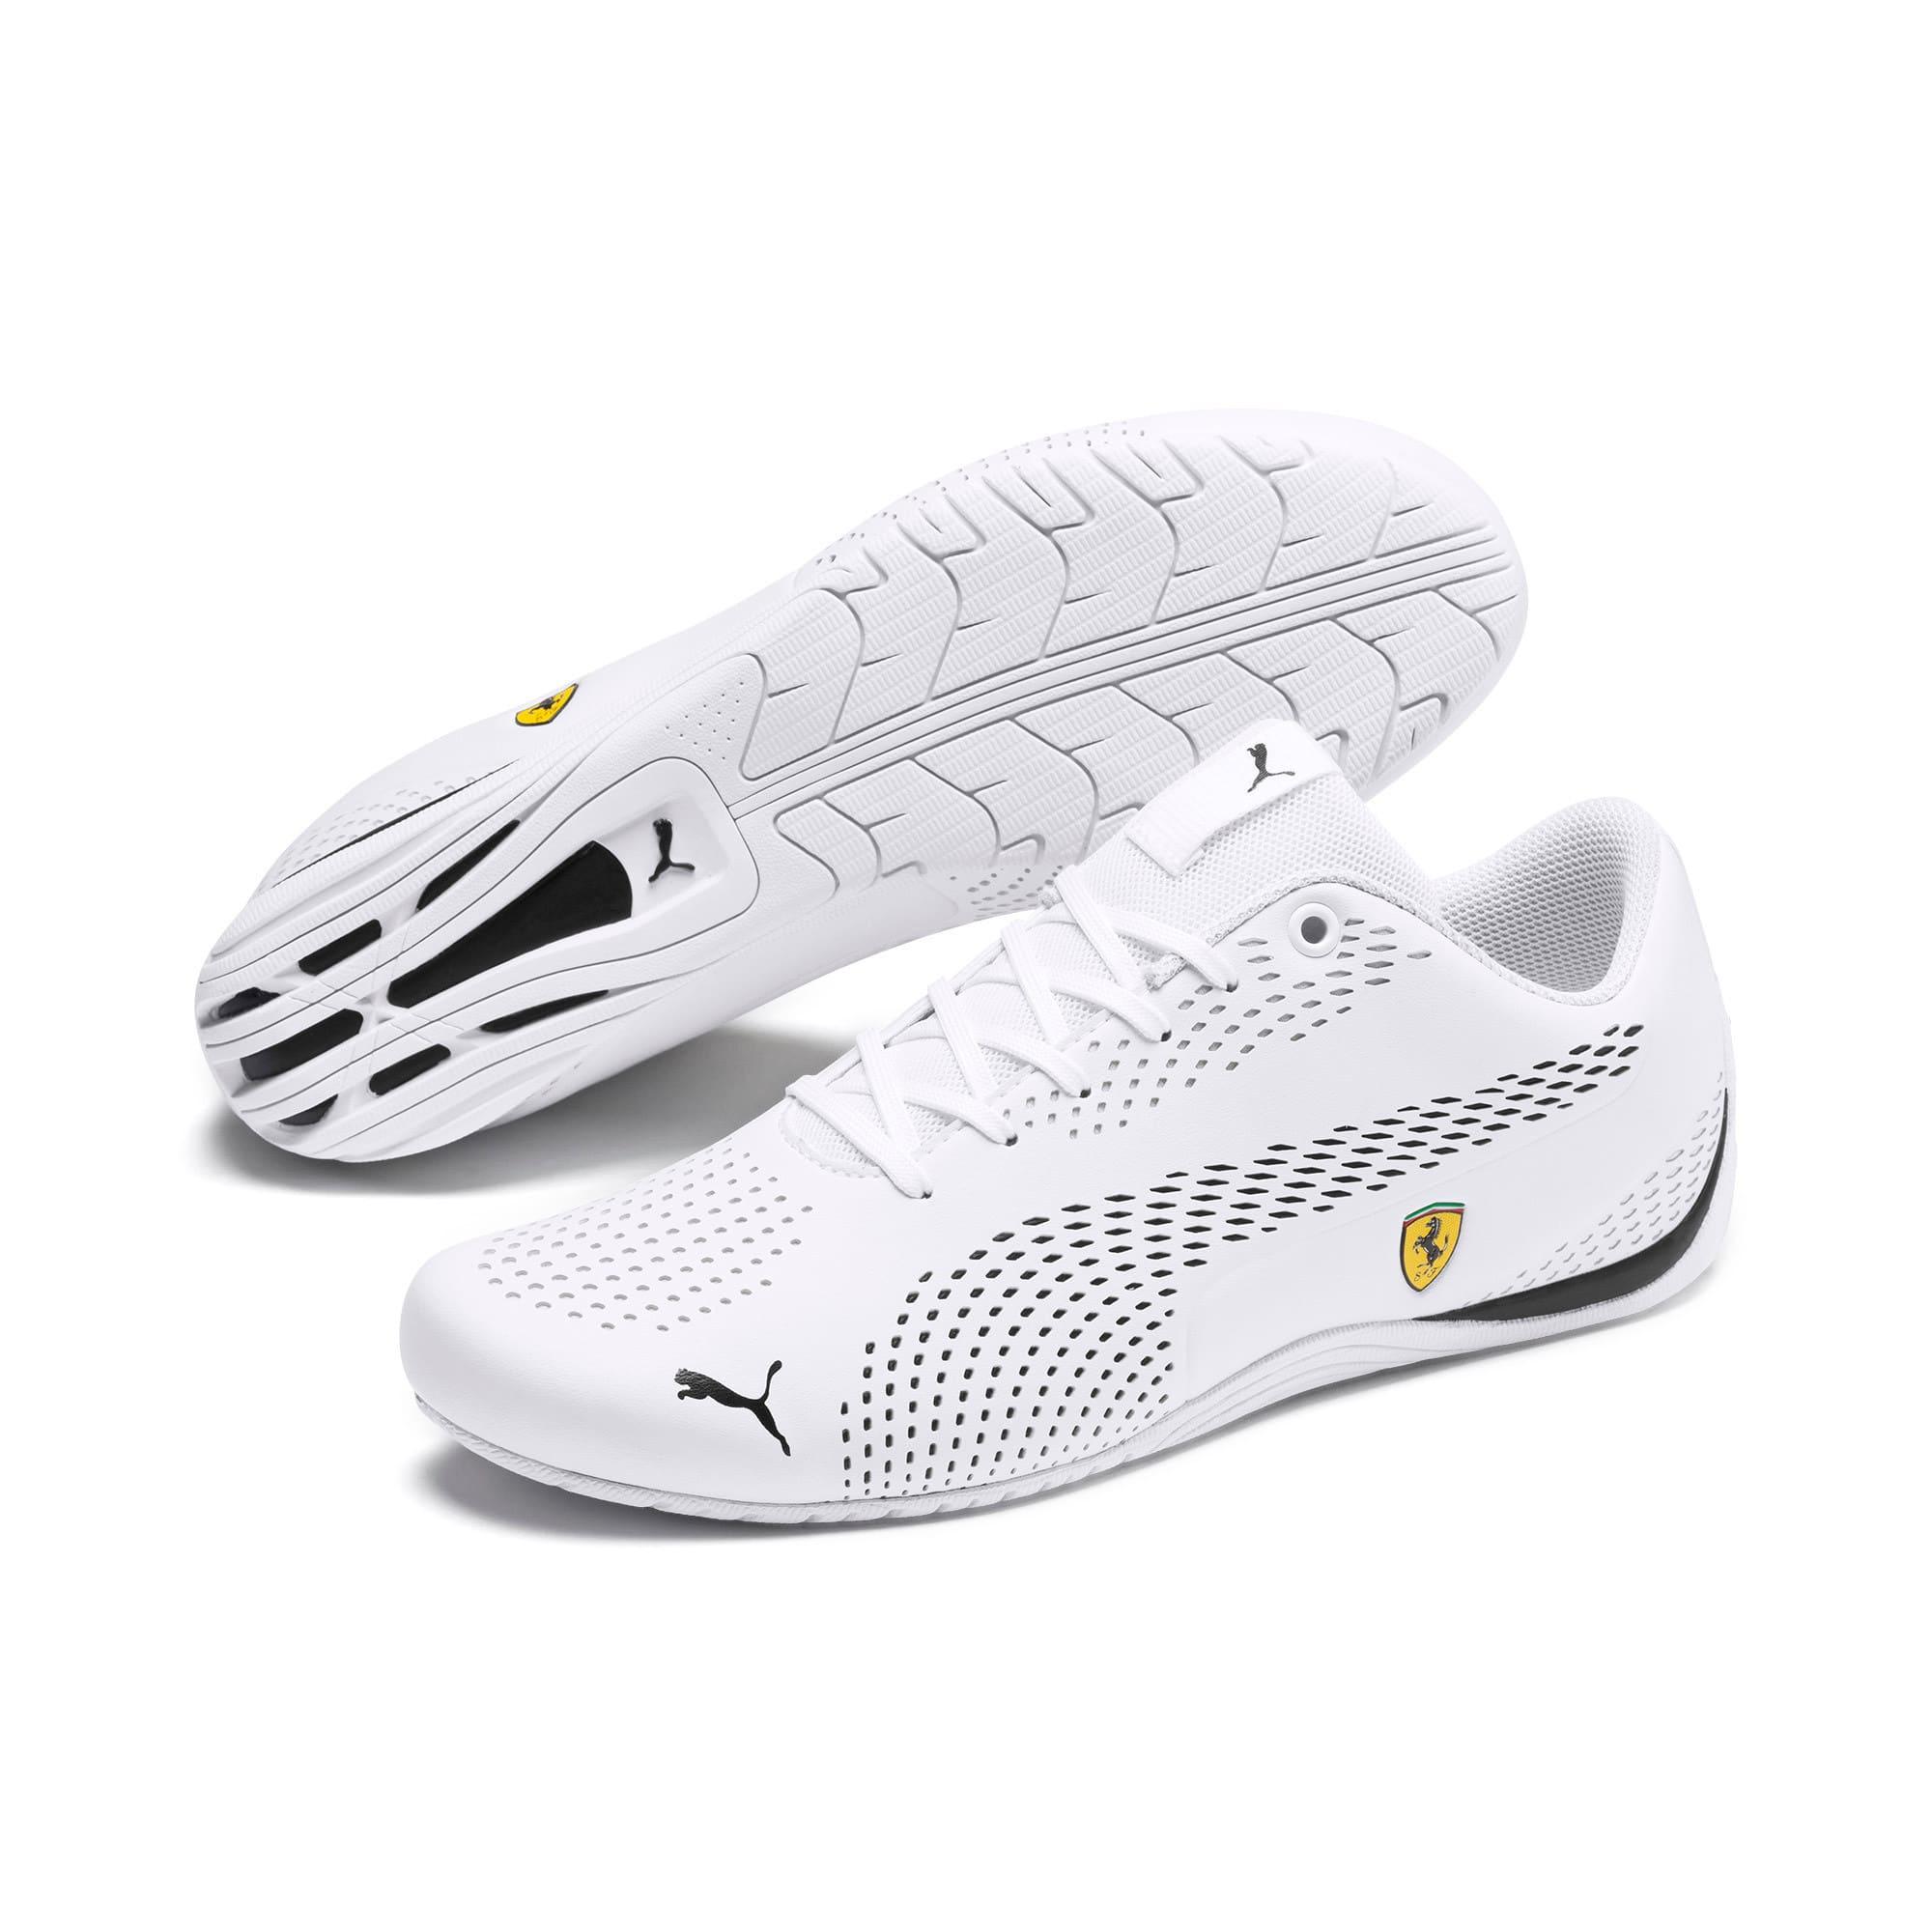 Thumbnail 3 of Scuderia Ferrari Drift Cat 5 Ultra II Shoes, Puma White-Puma Black, medium